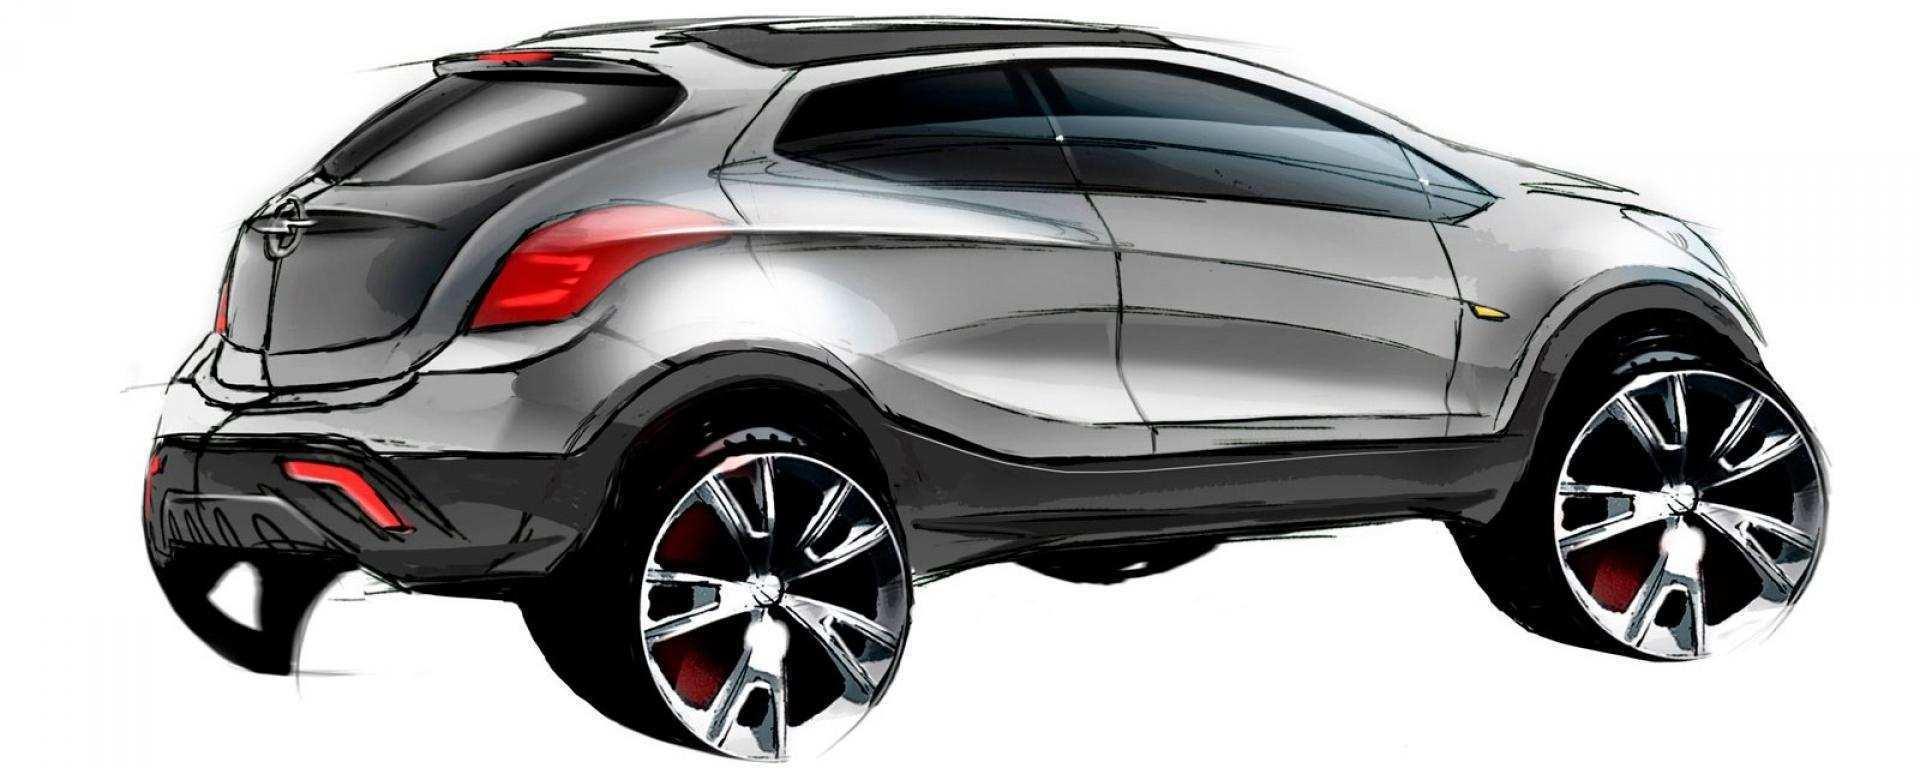 24 New Motori 2020 Peugeot Speed Test with Motori 2020 Peugeot